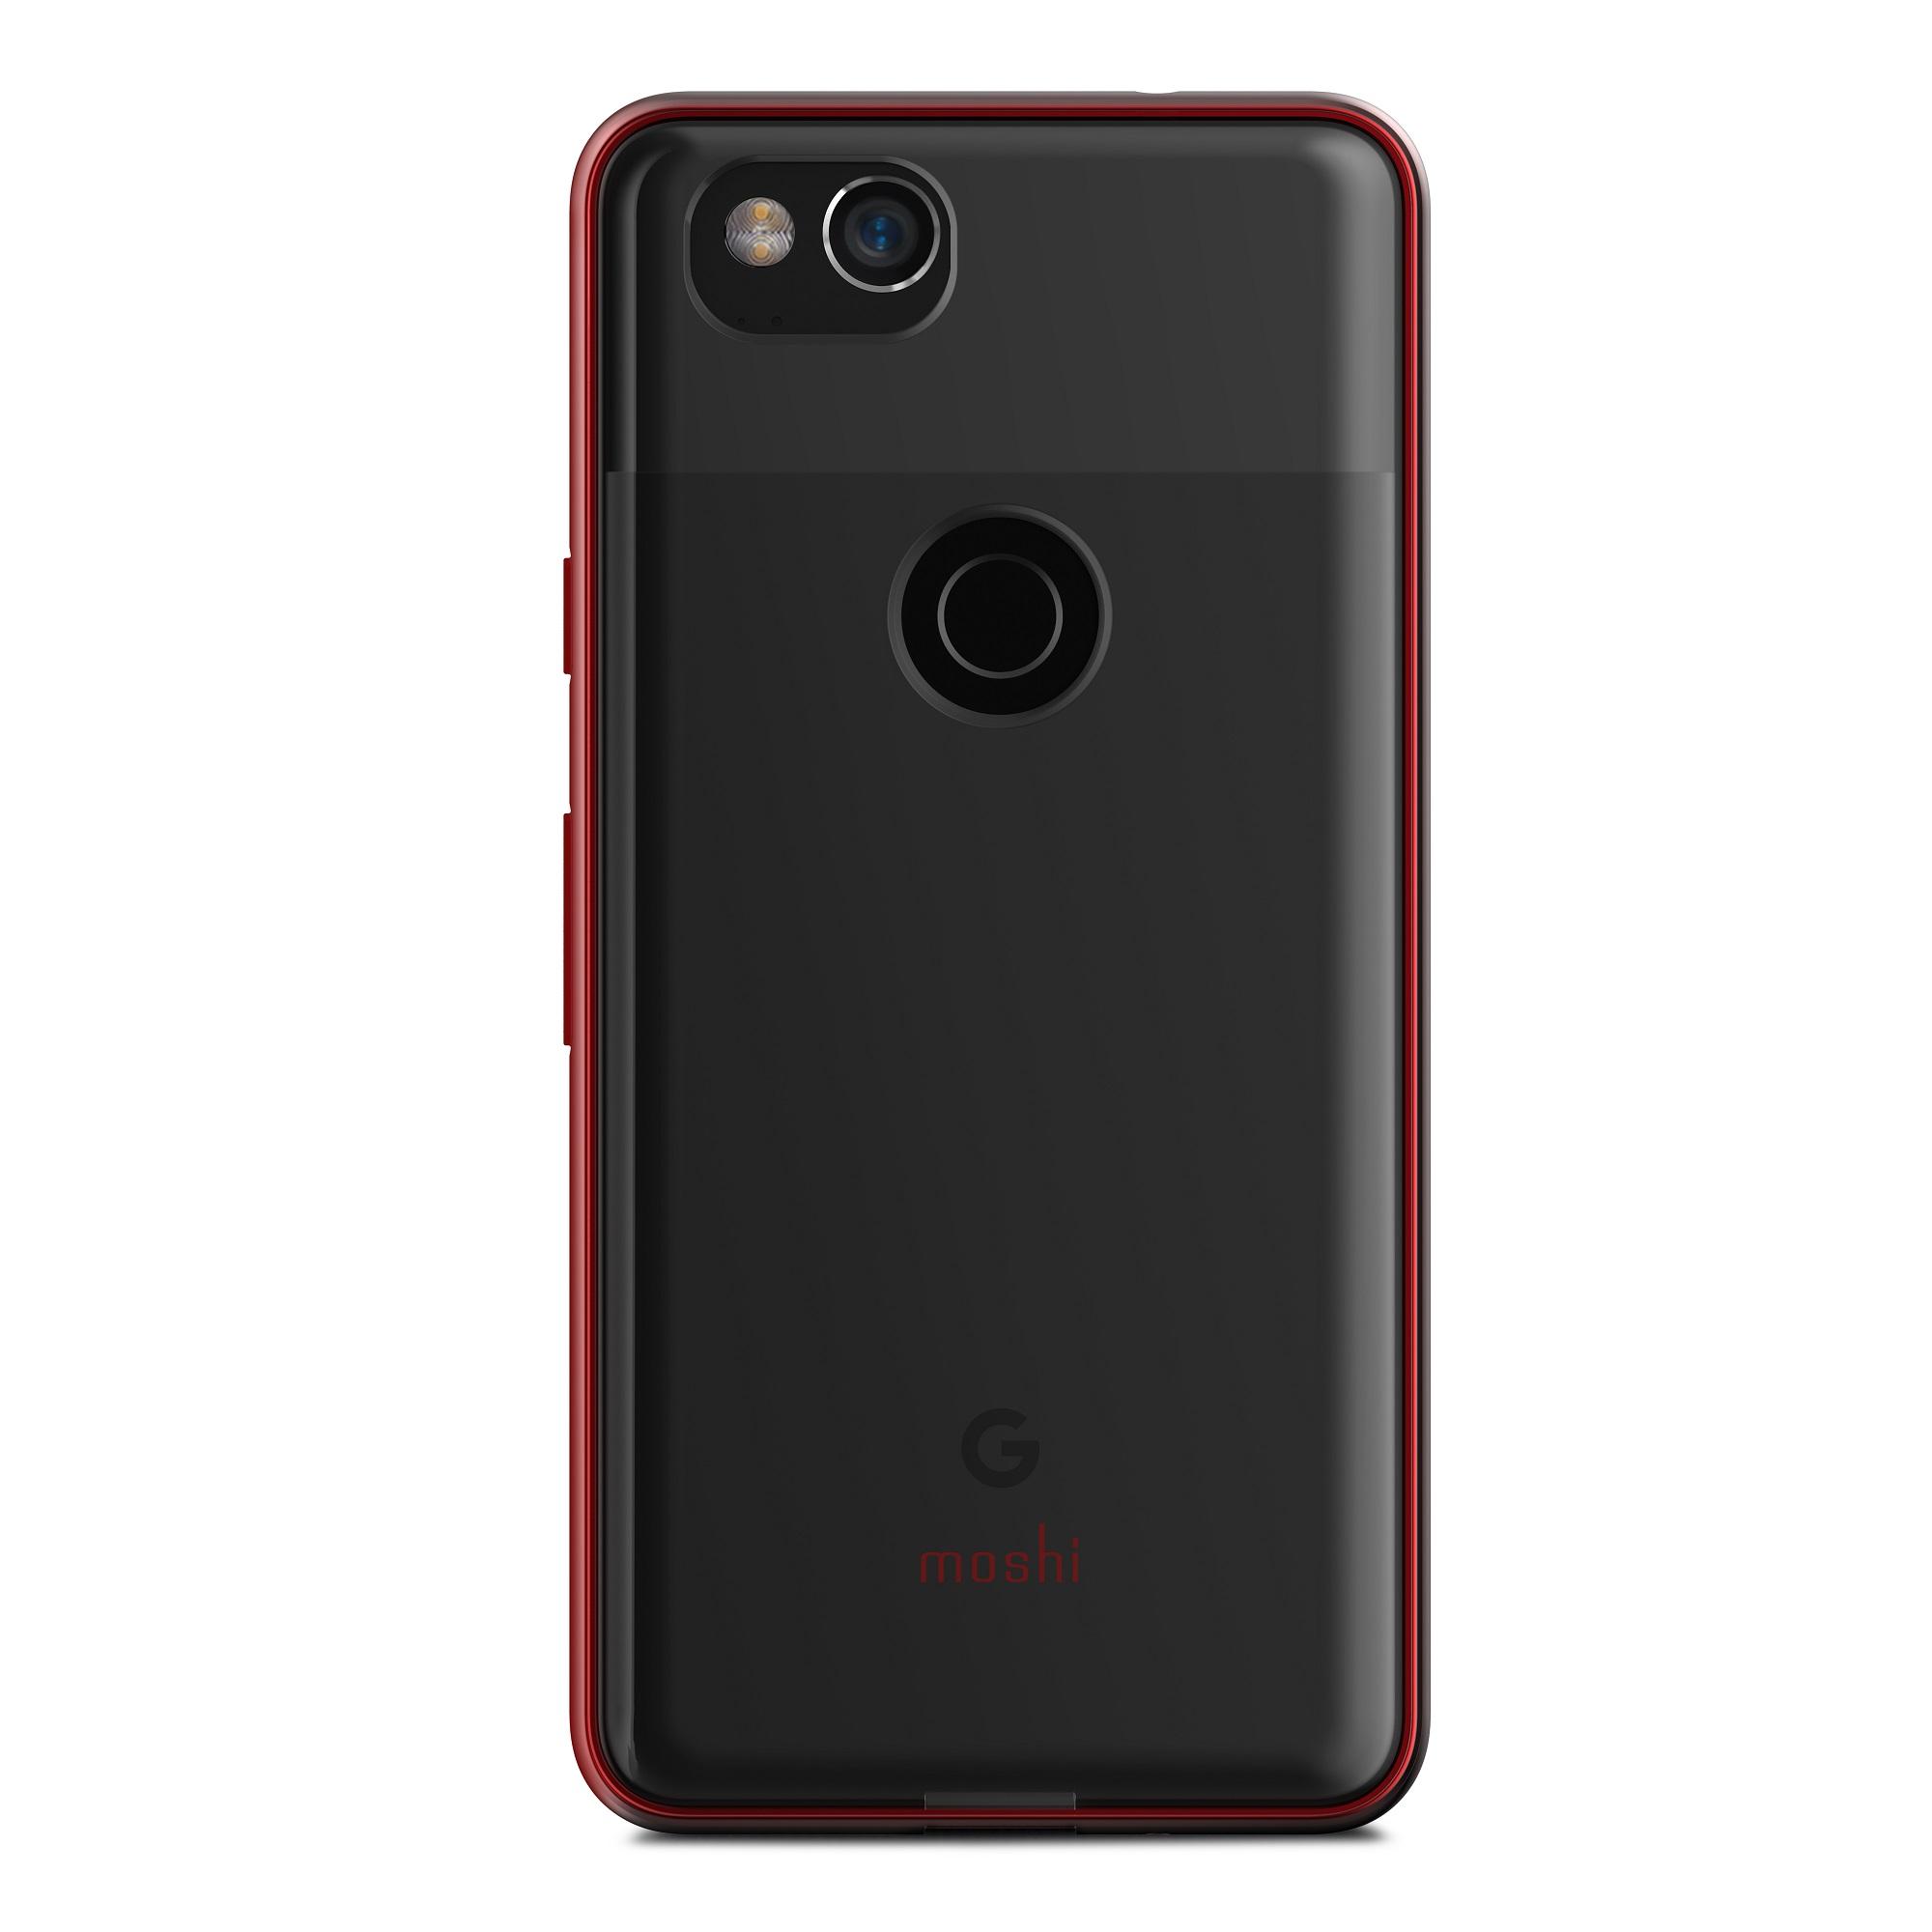 Moshi Vitros Case for Google Pixel 2